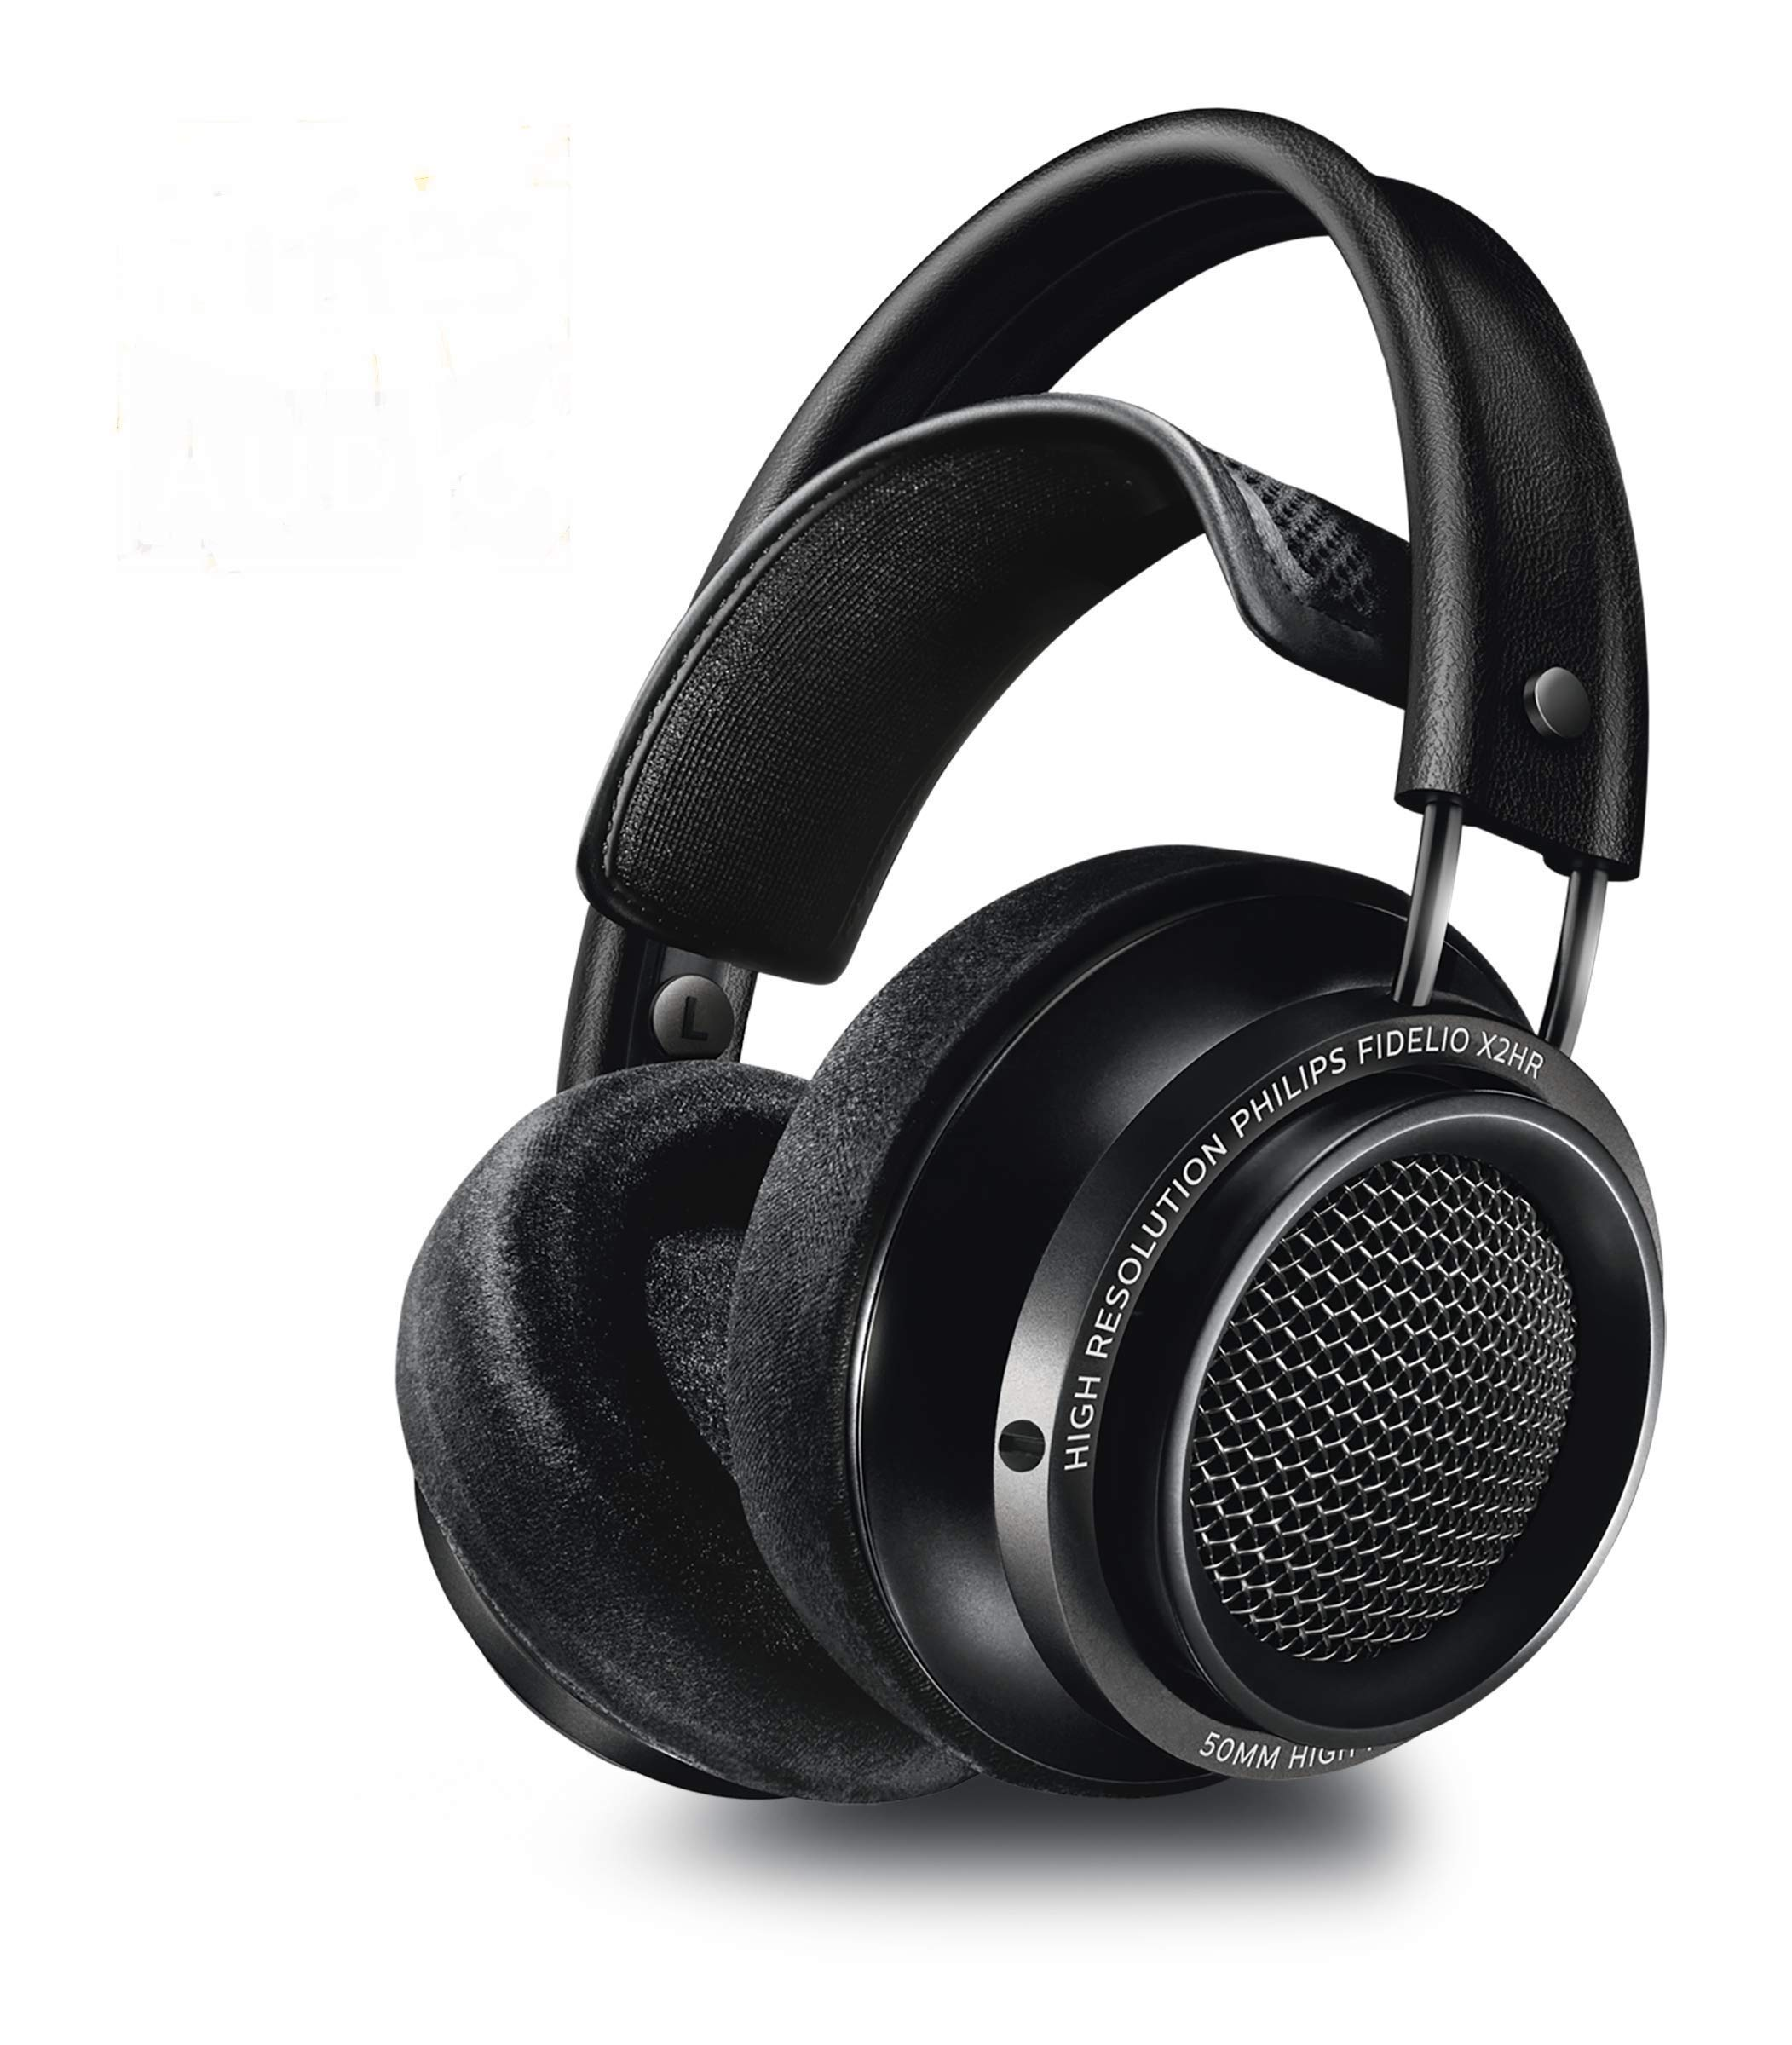 Philips Fidelio X2HR Over-Ear Open-Air Headphone - Black by Philips Audio